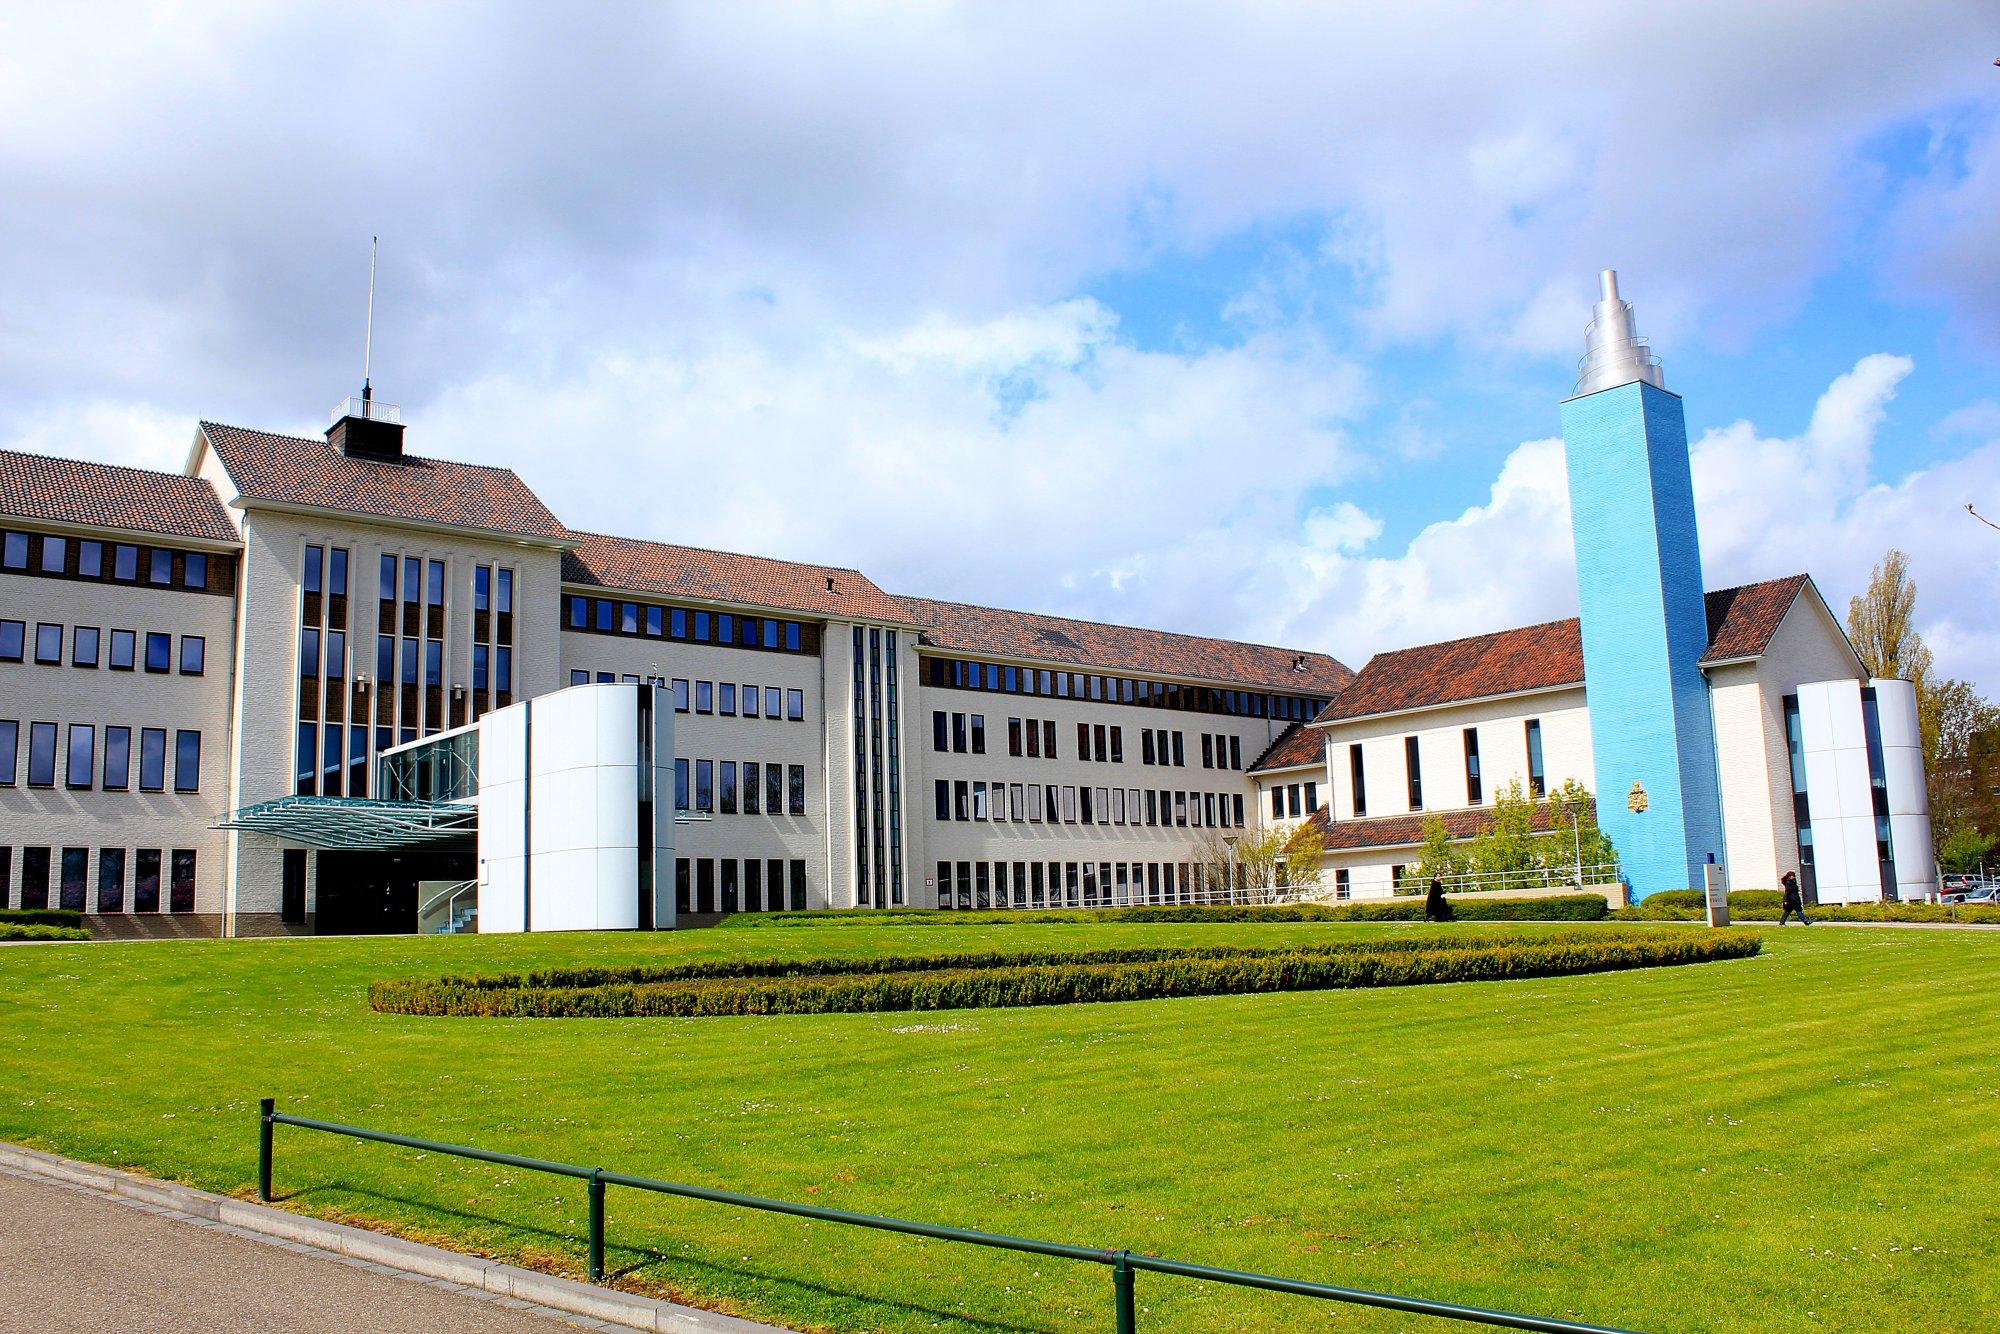 Aantal faillissementen in Limburg omlaag - L1